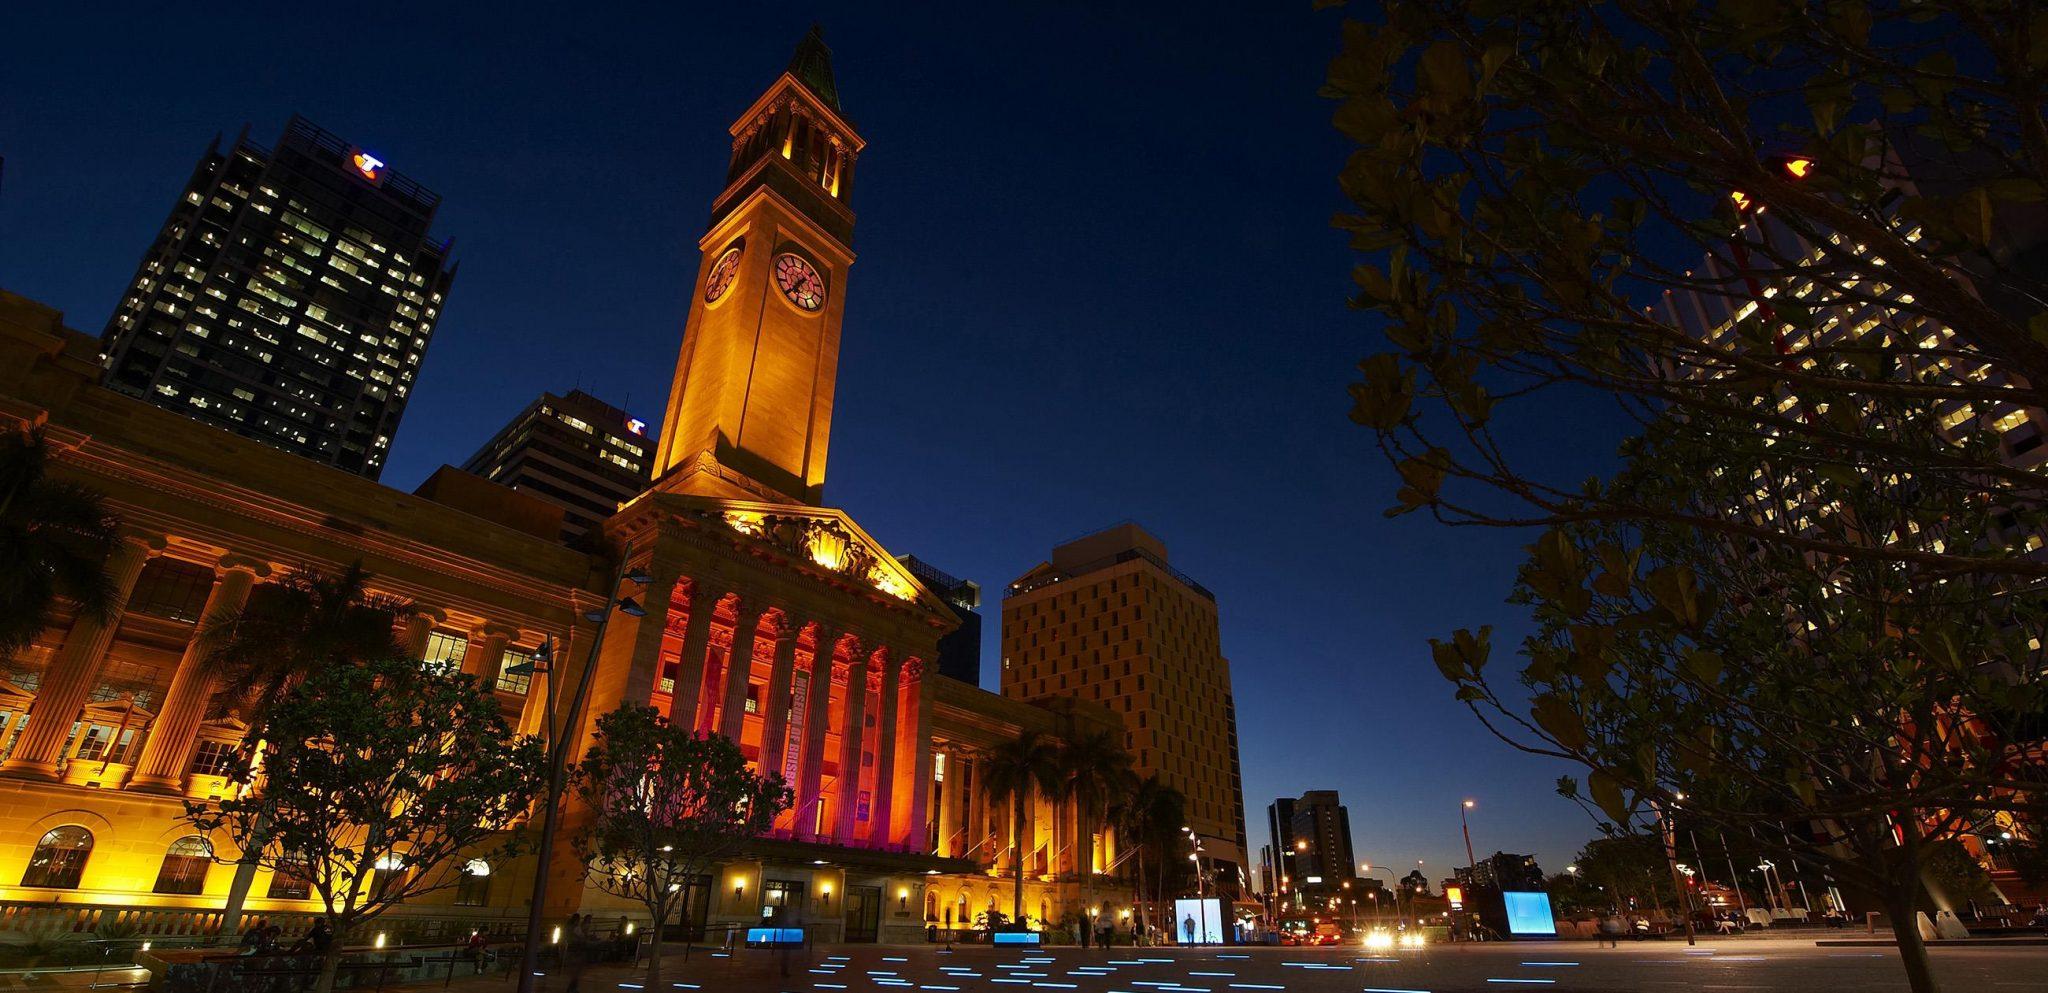 Brisbane City Town Hall Night View 布里斯班市政厅夜景